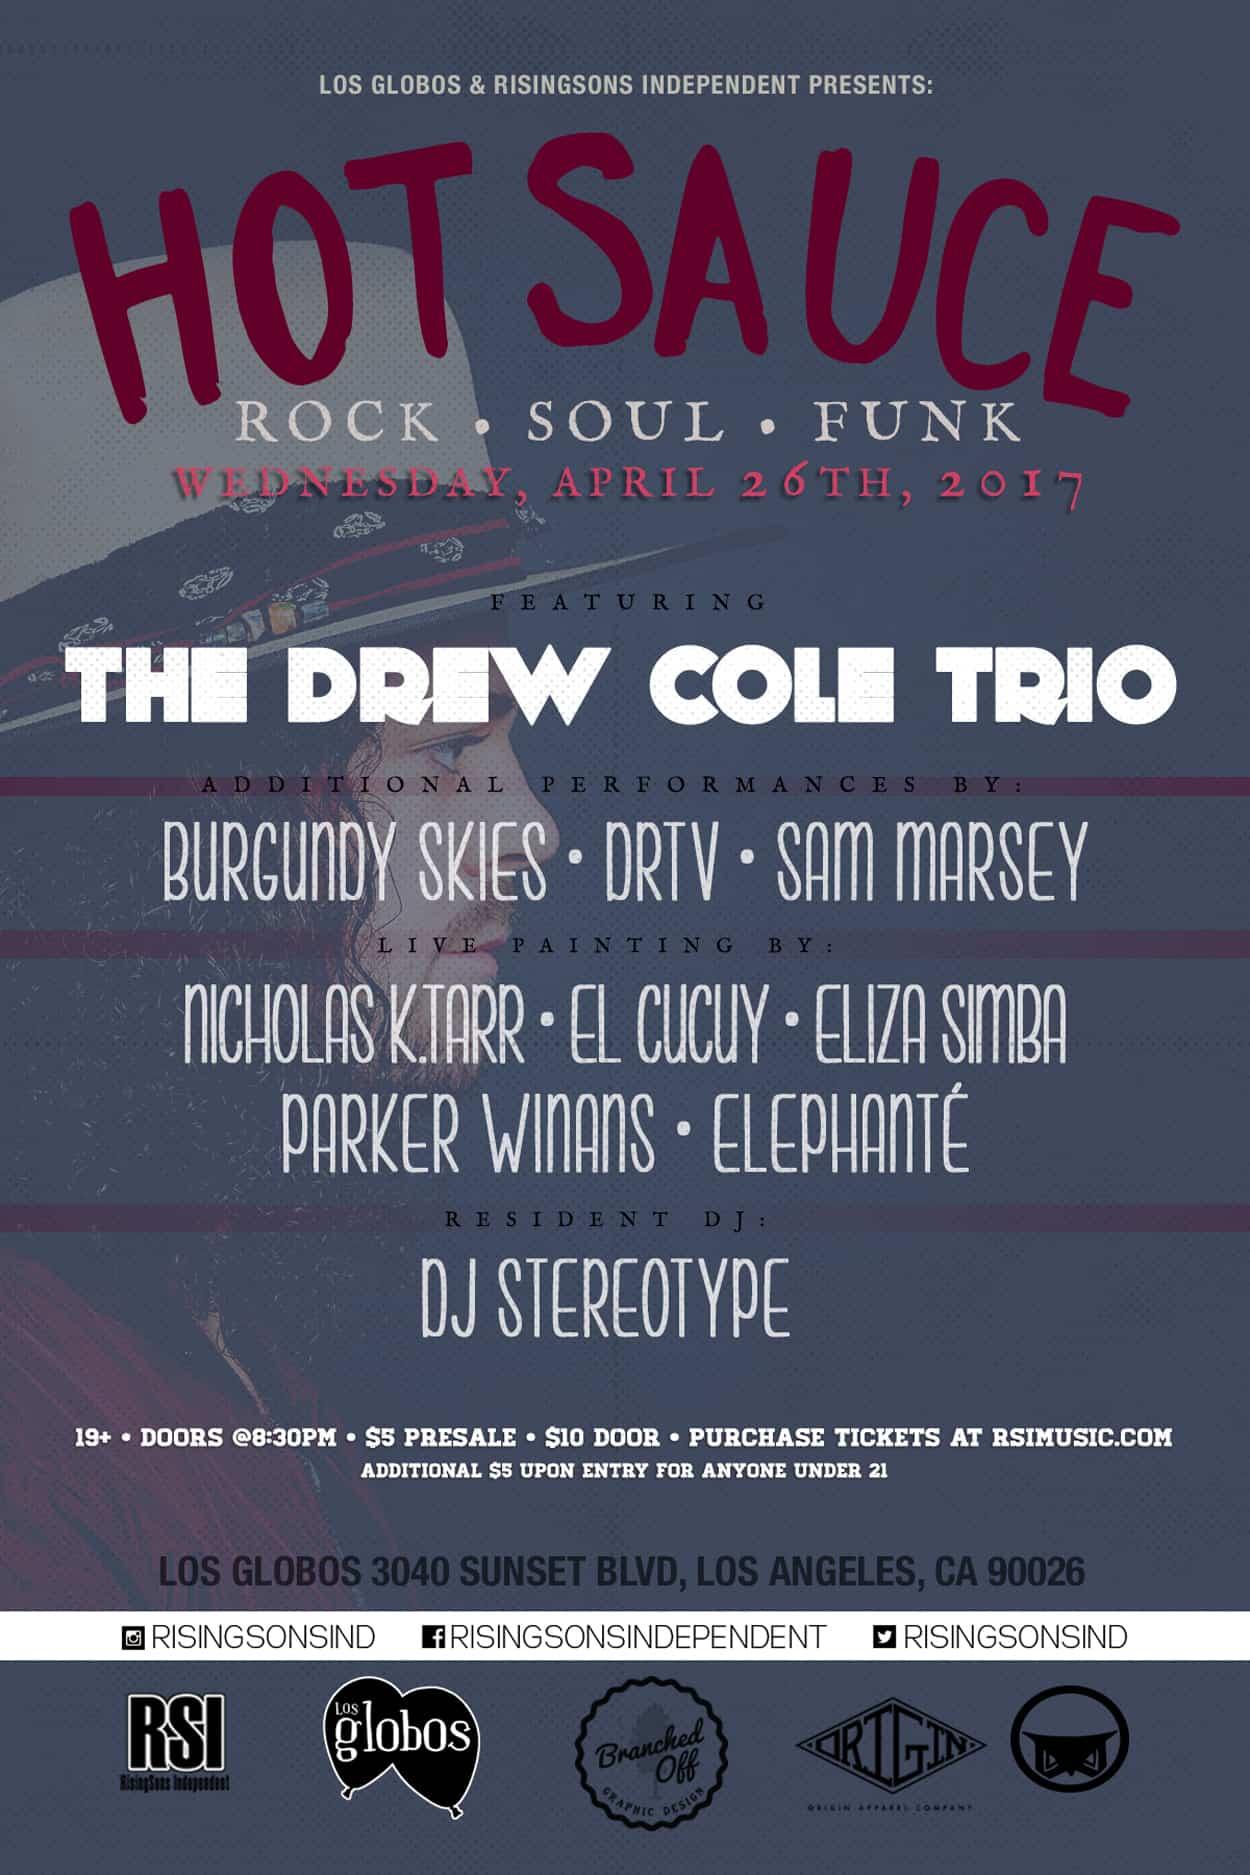 Hot Sauce - The Drew Cole Trio - Flyer Design